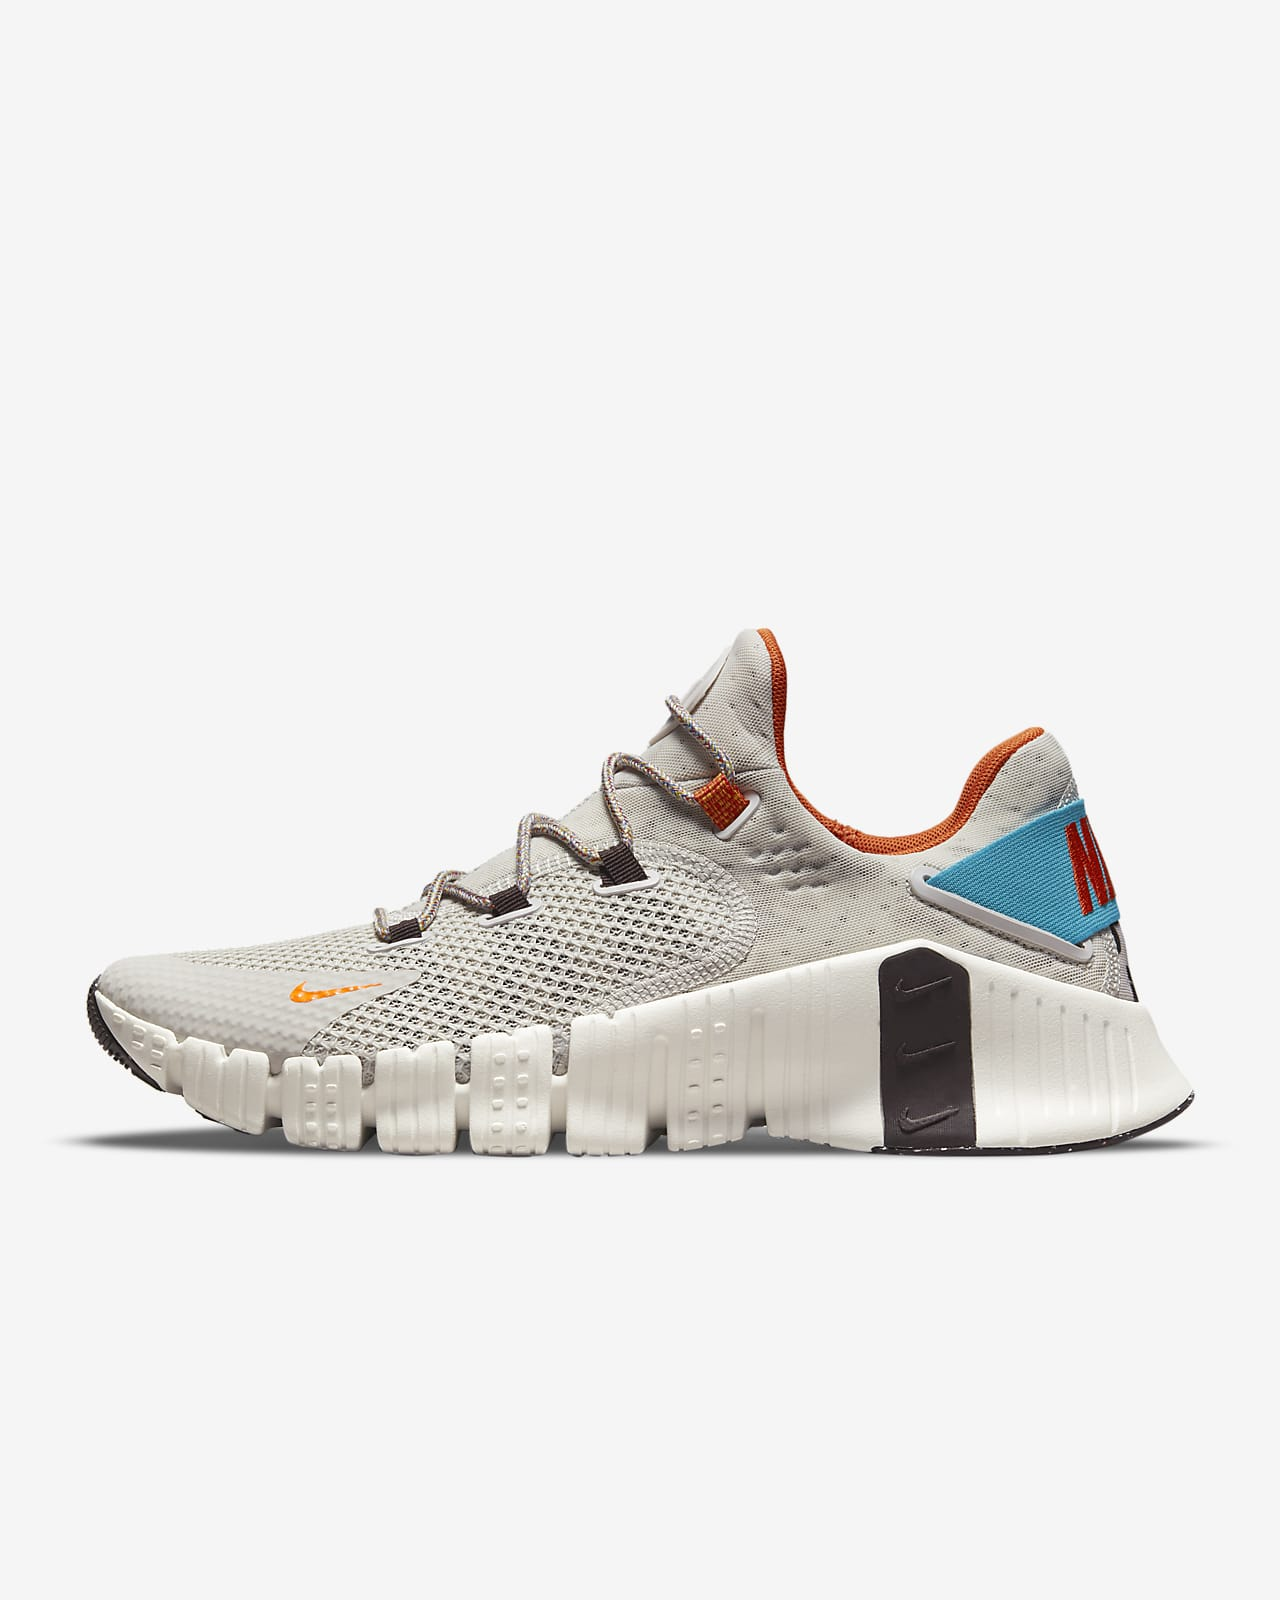 Tréninková bota Nike Free Metcon4